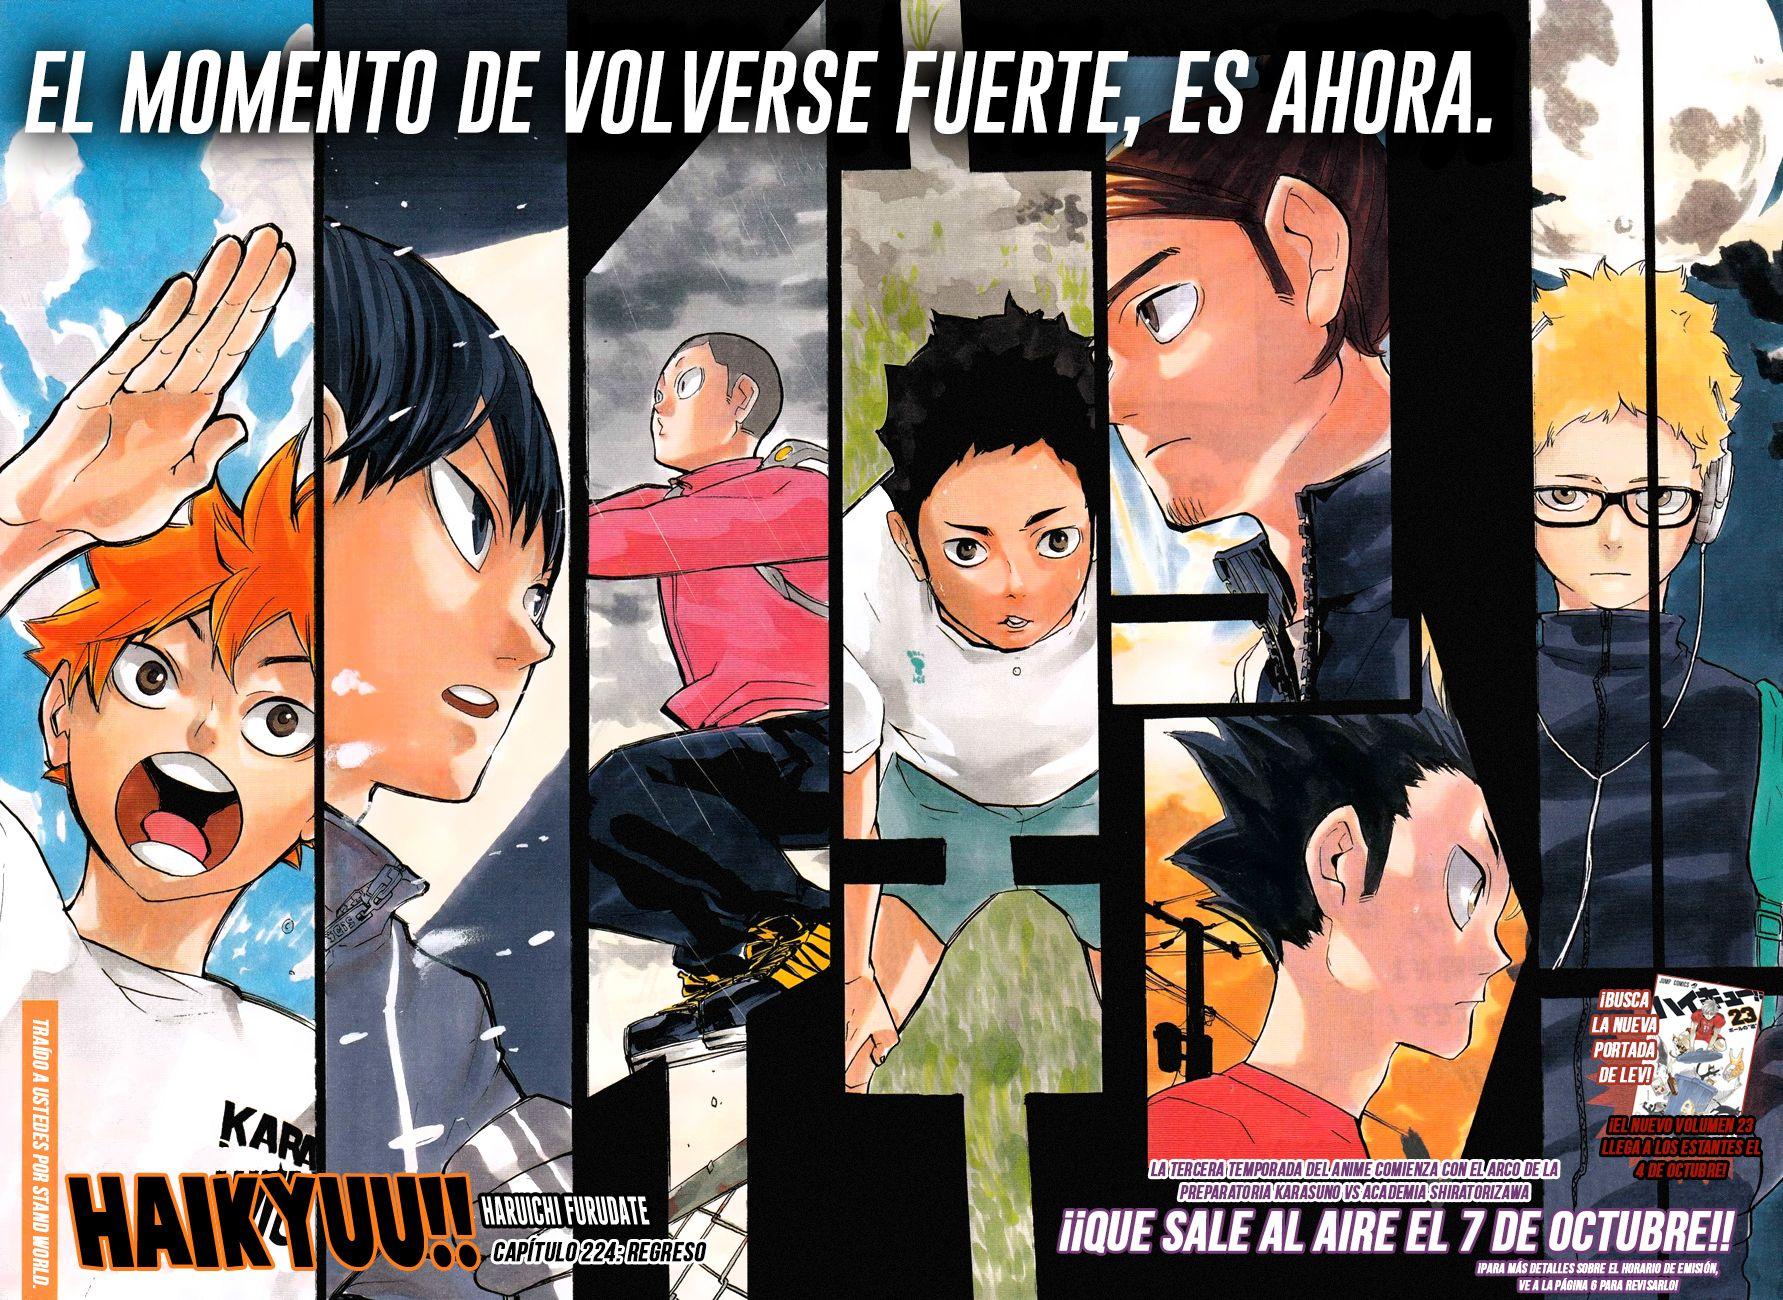 http://c5.ninemanga.com/es_manga/pic2/10/10/506783/1397d4cc66d68ce758c935d4314073b2.jpg Page 4